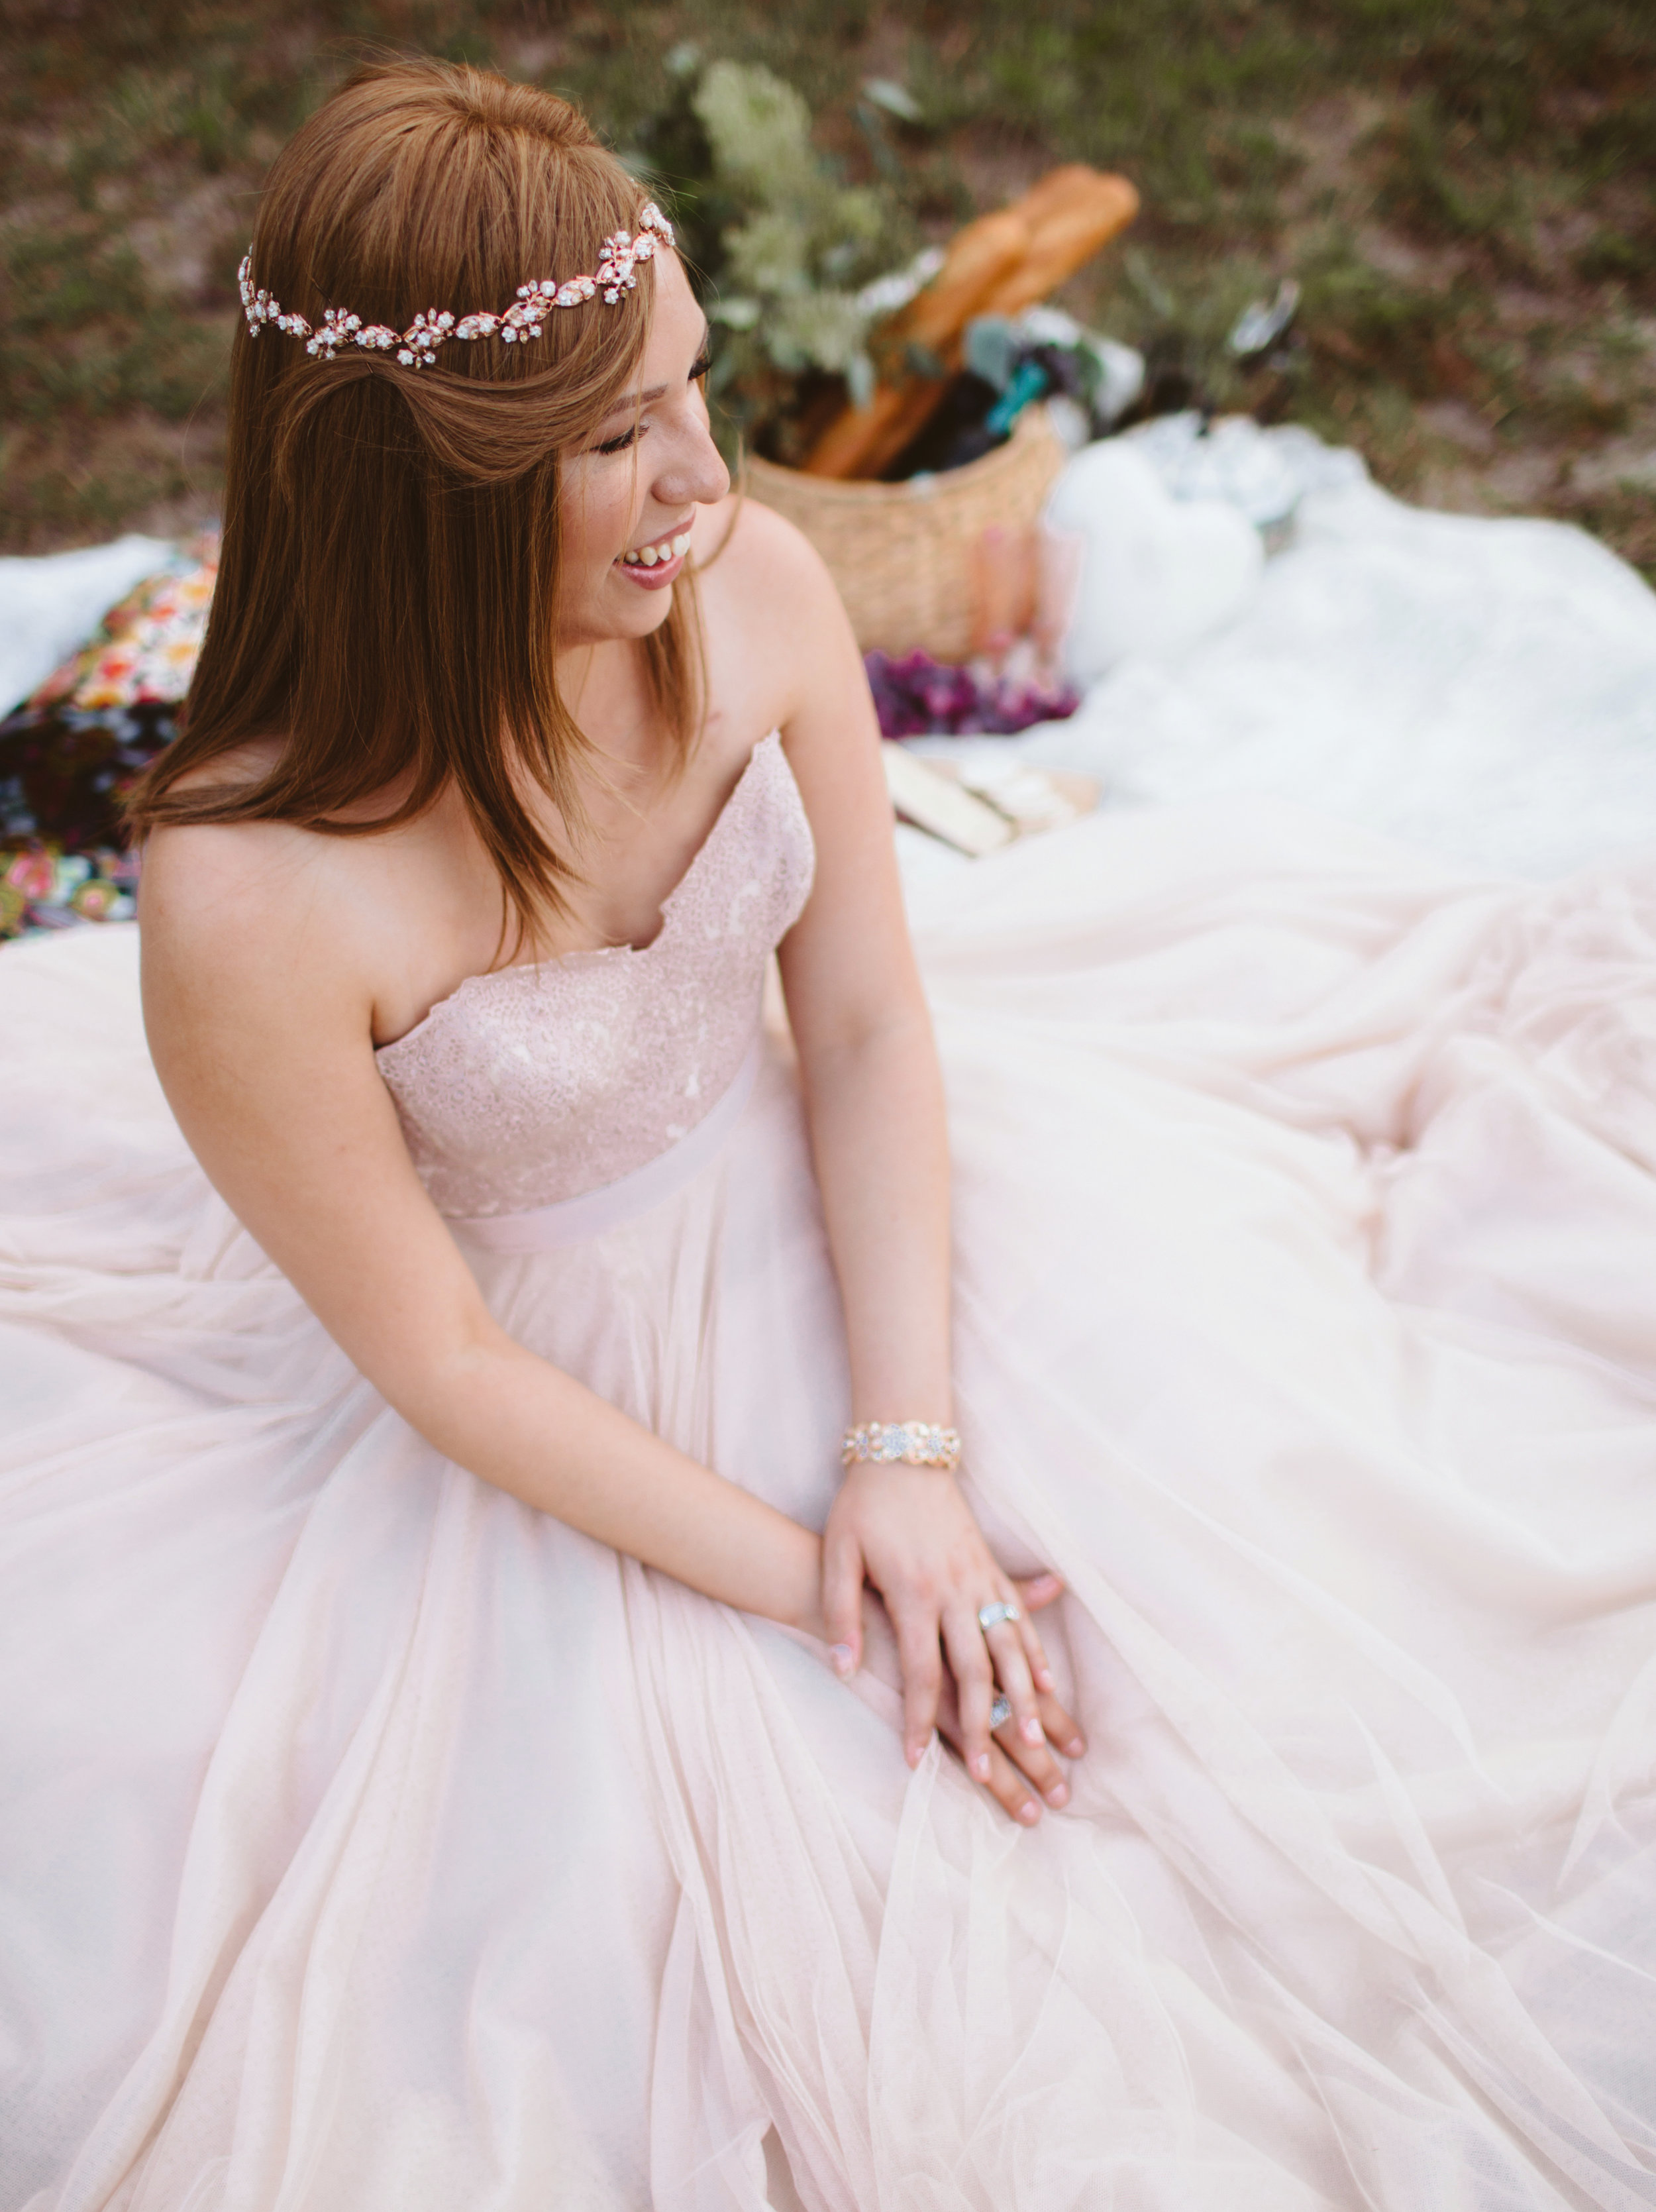 Breast Cancer awareness | Solutions bridal | Waterswoo | Vanessa Boy | vanessaboy.com |-411.com |final.jpg